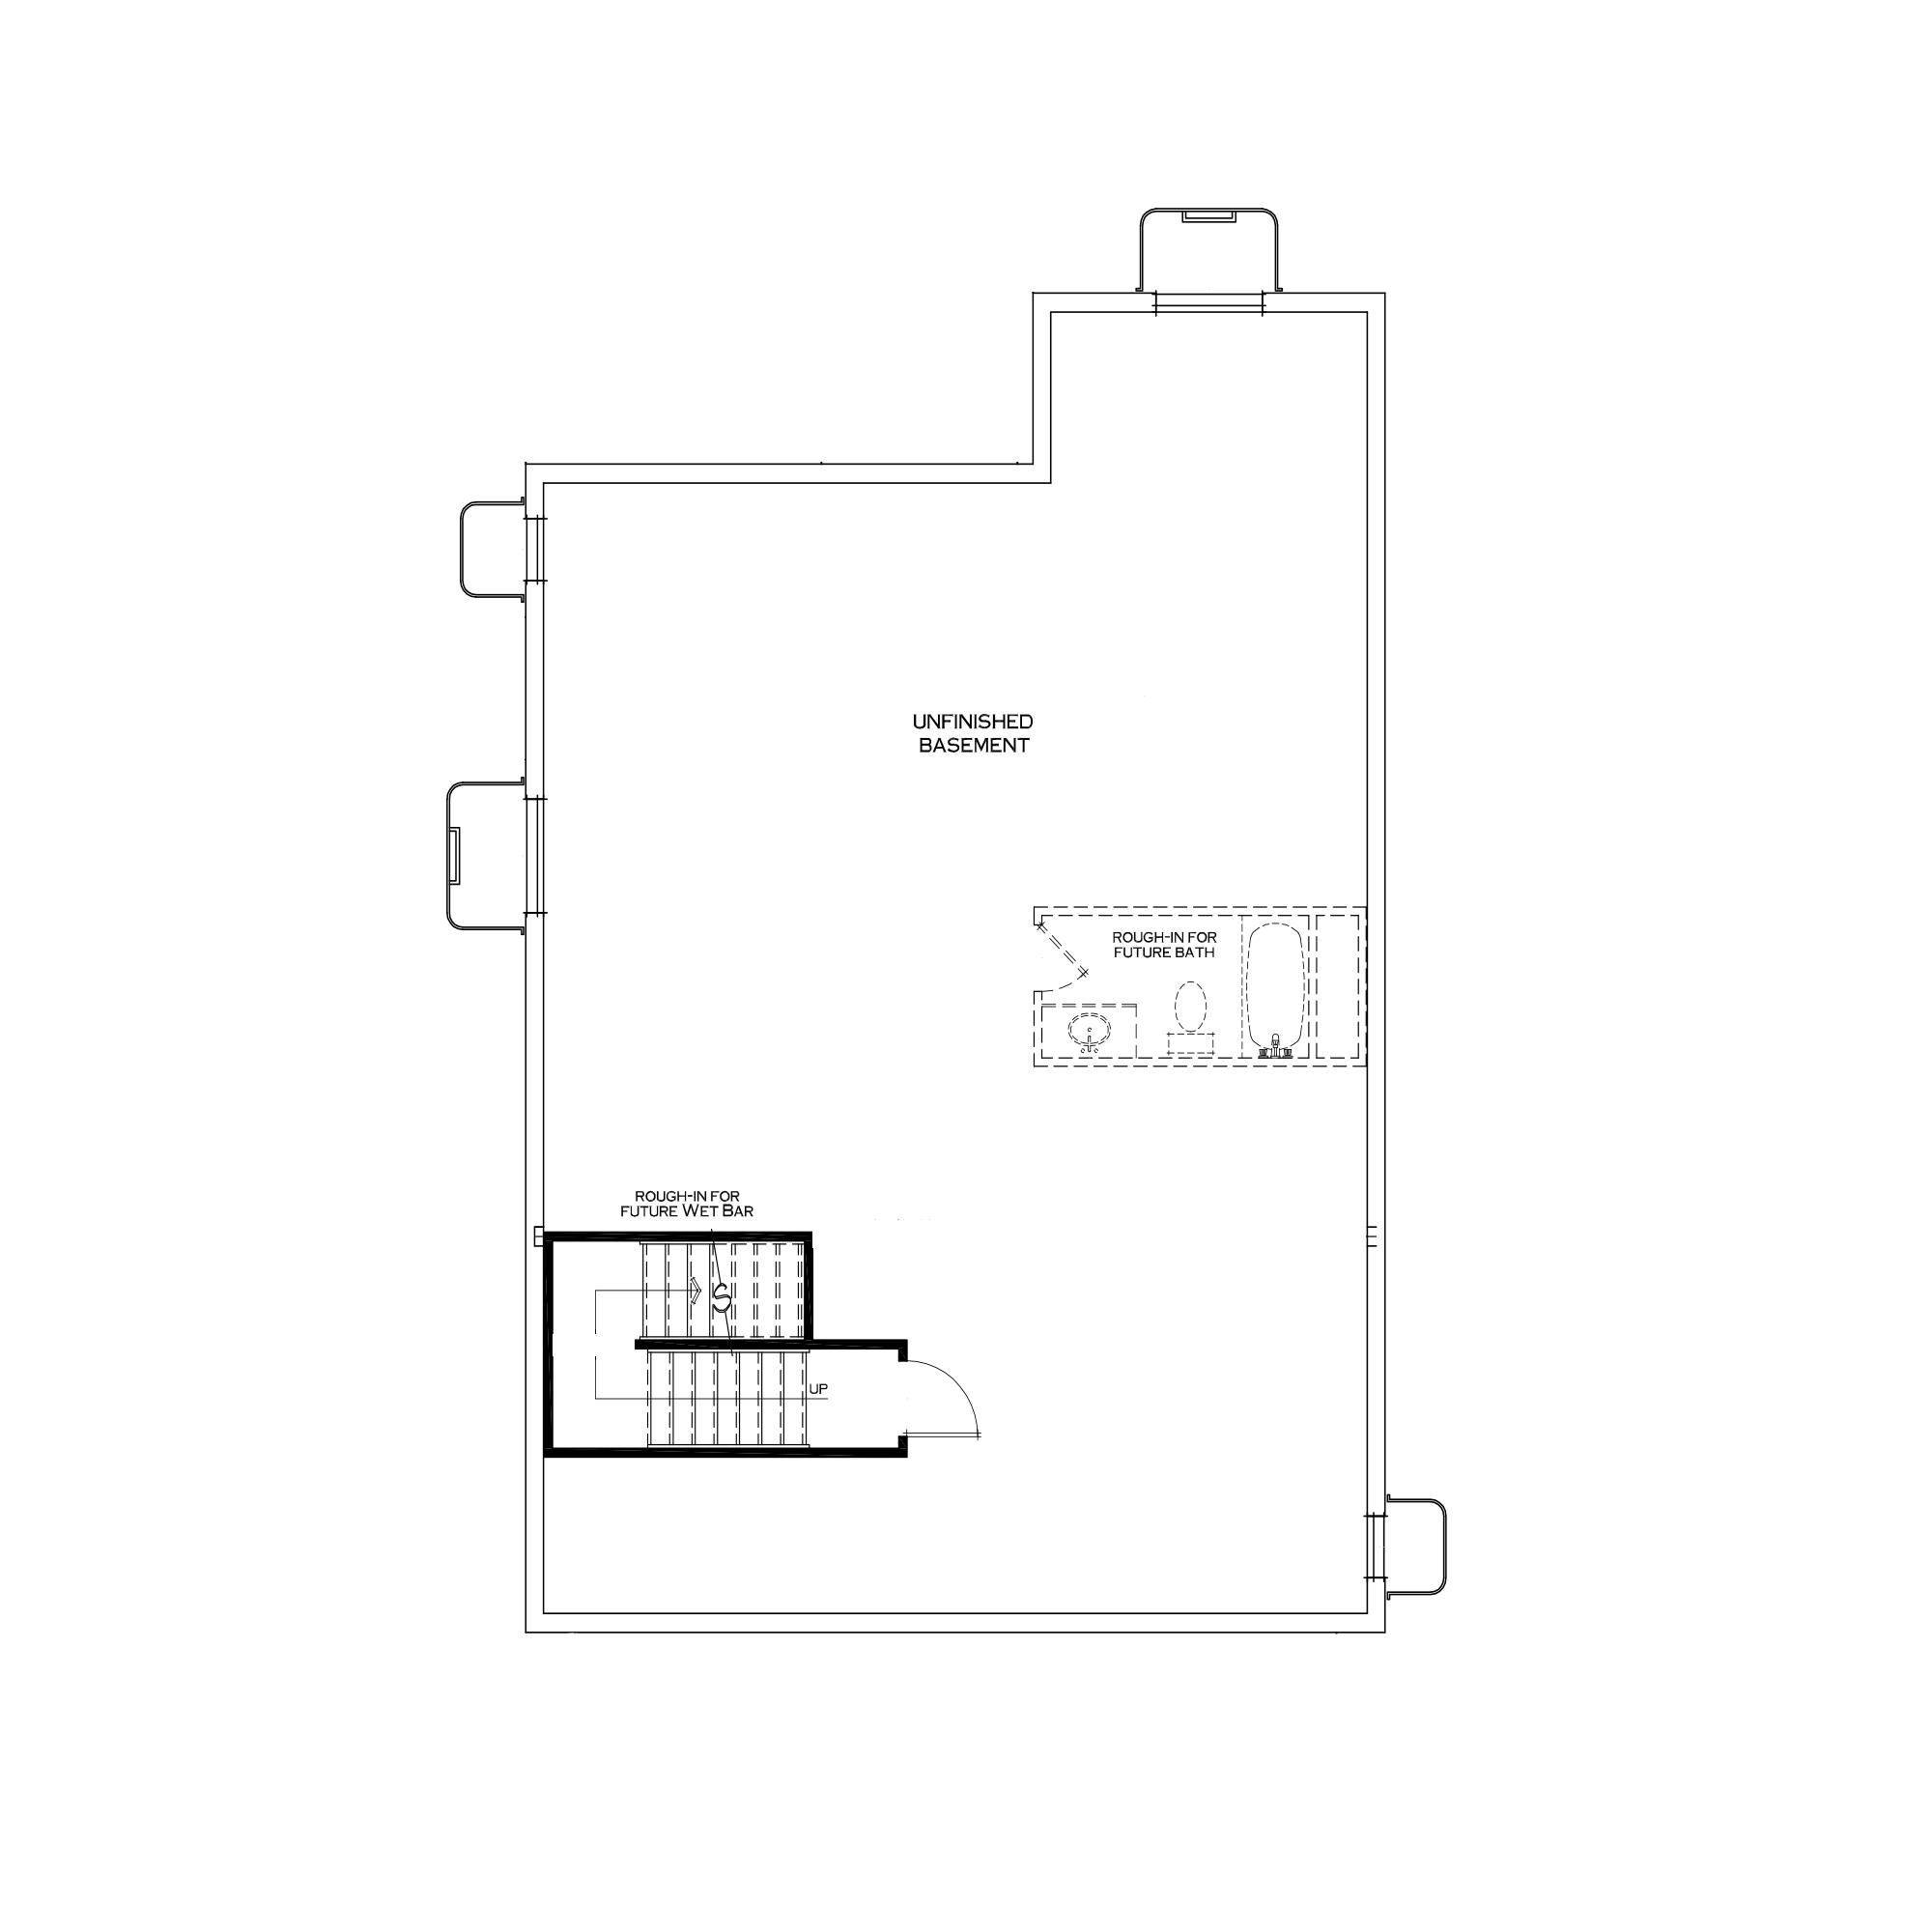 Standard Unfinished Basement